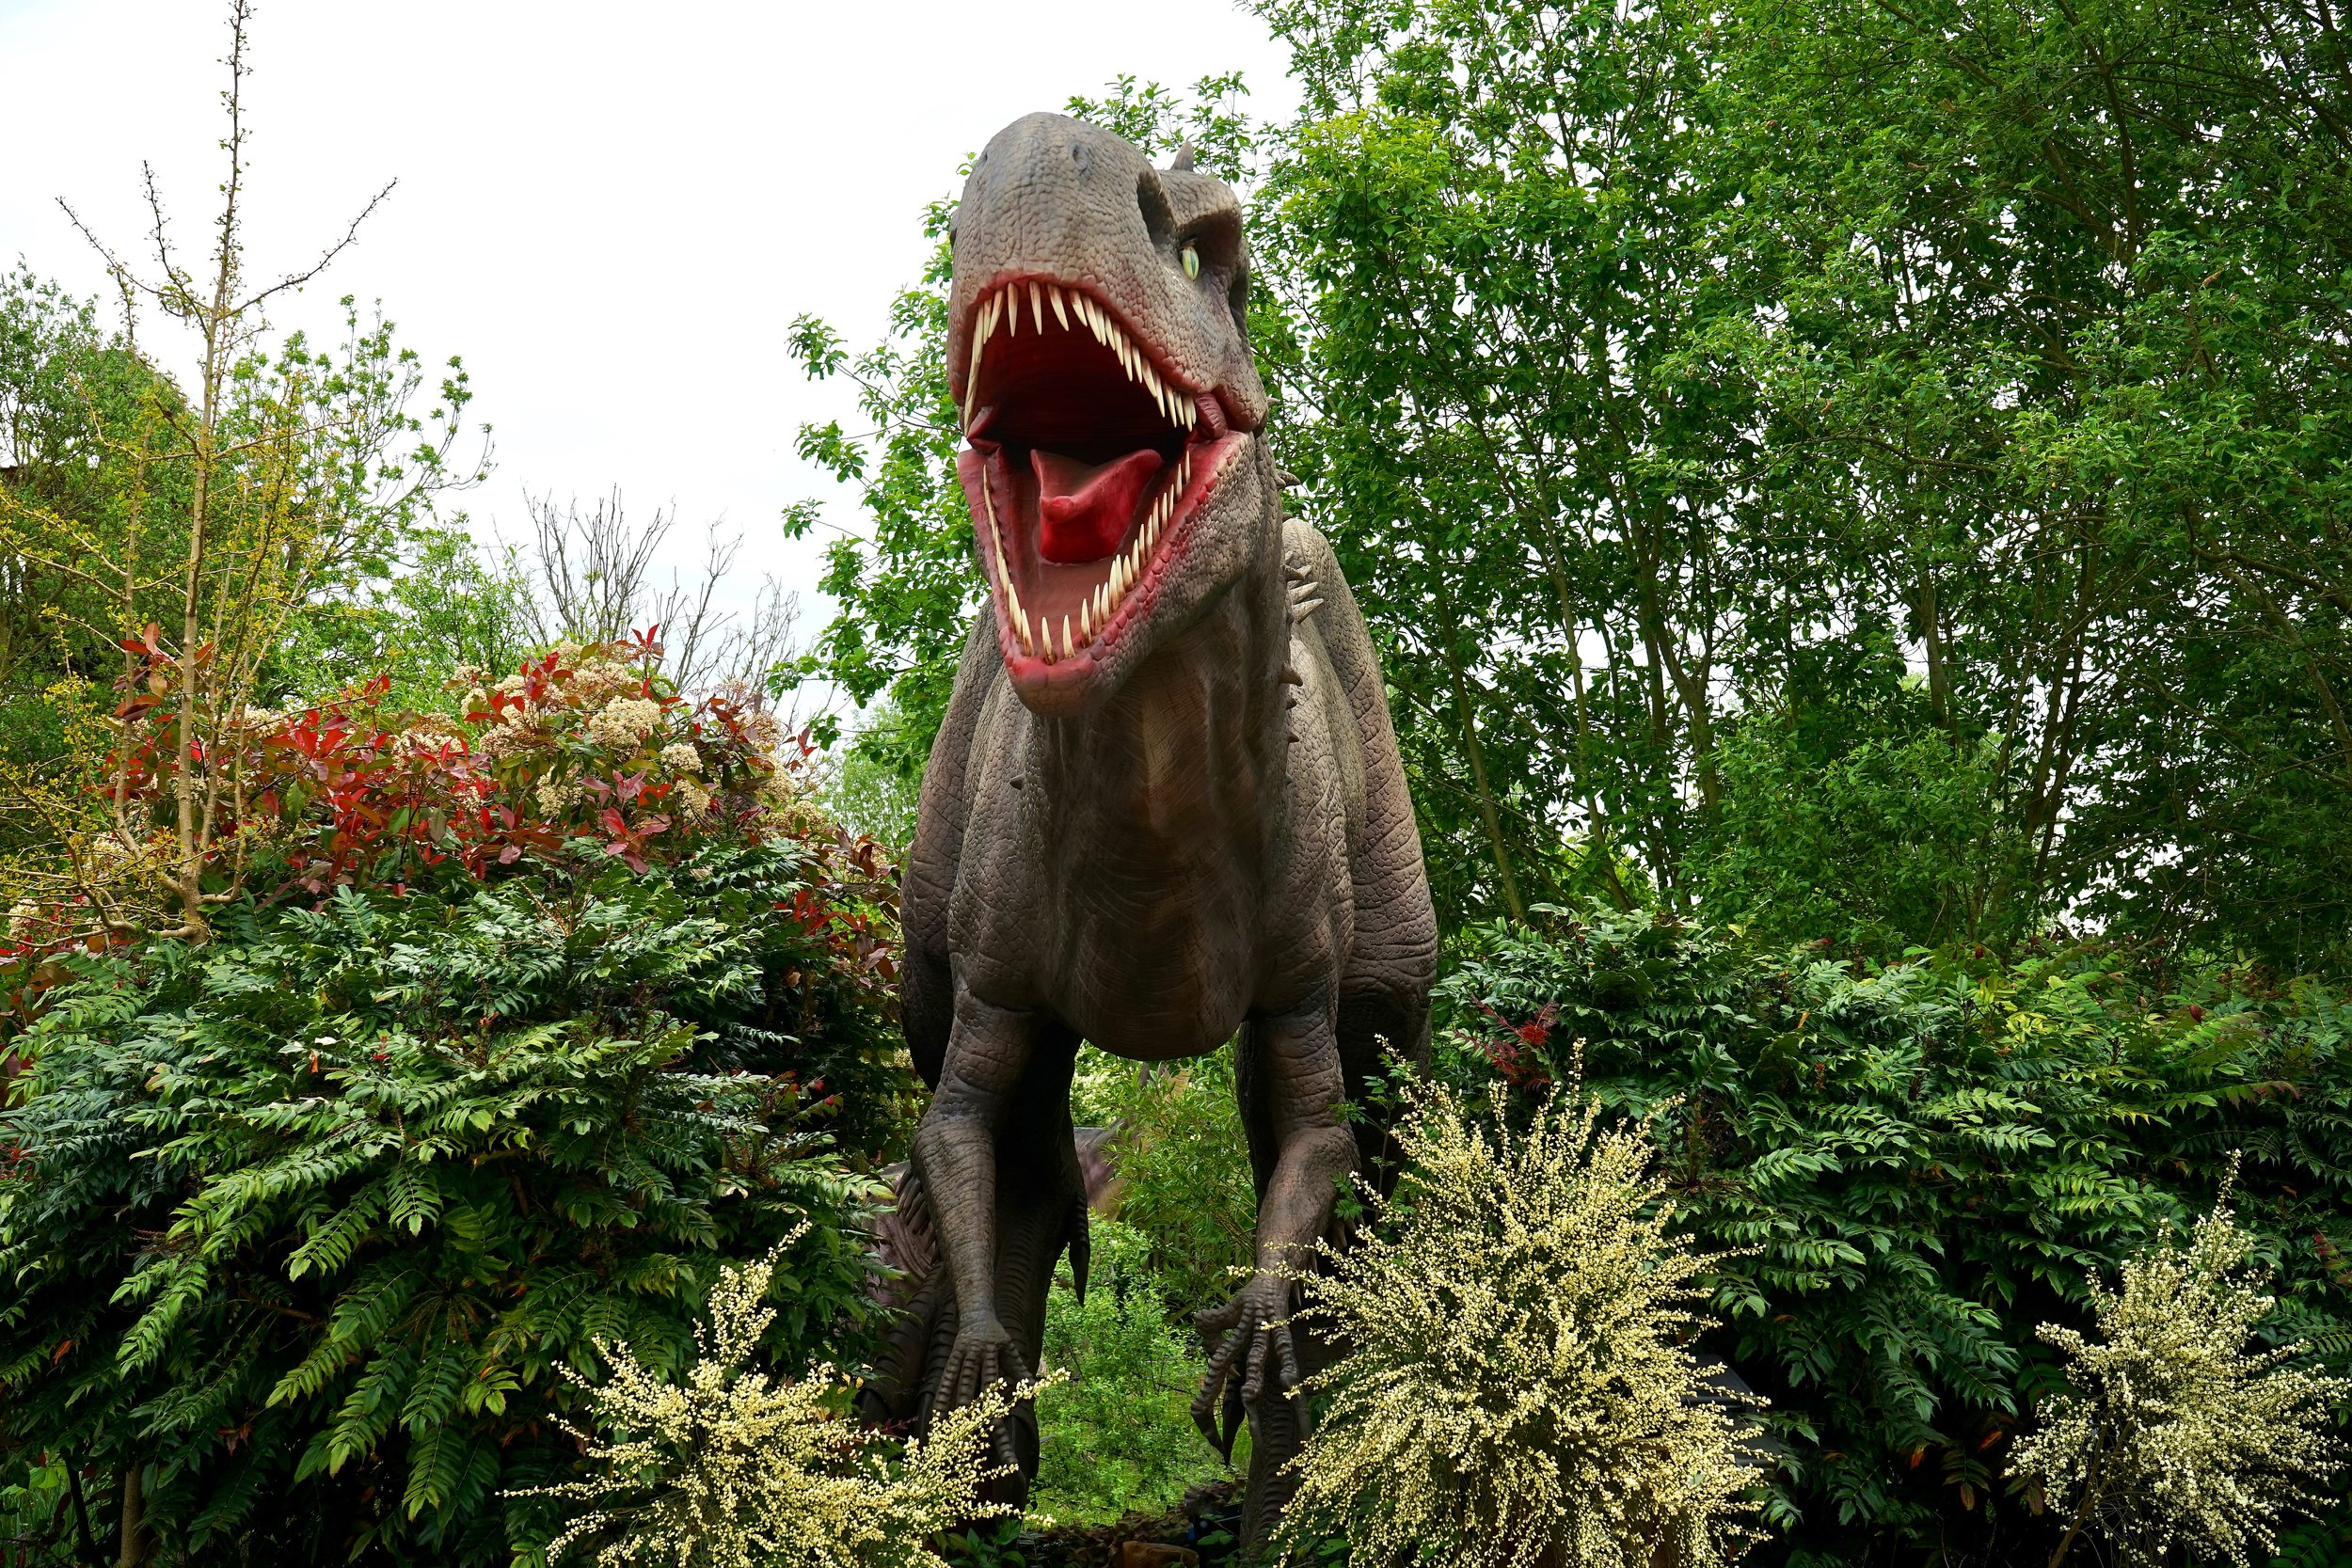 dinosaur-evergreen-figure-410856.jpg